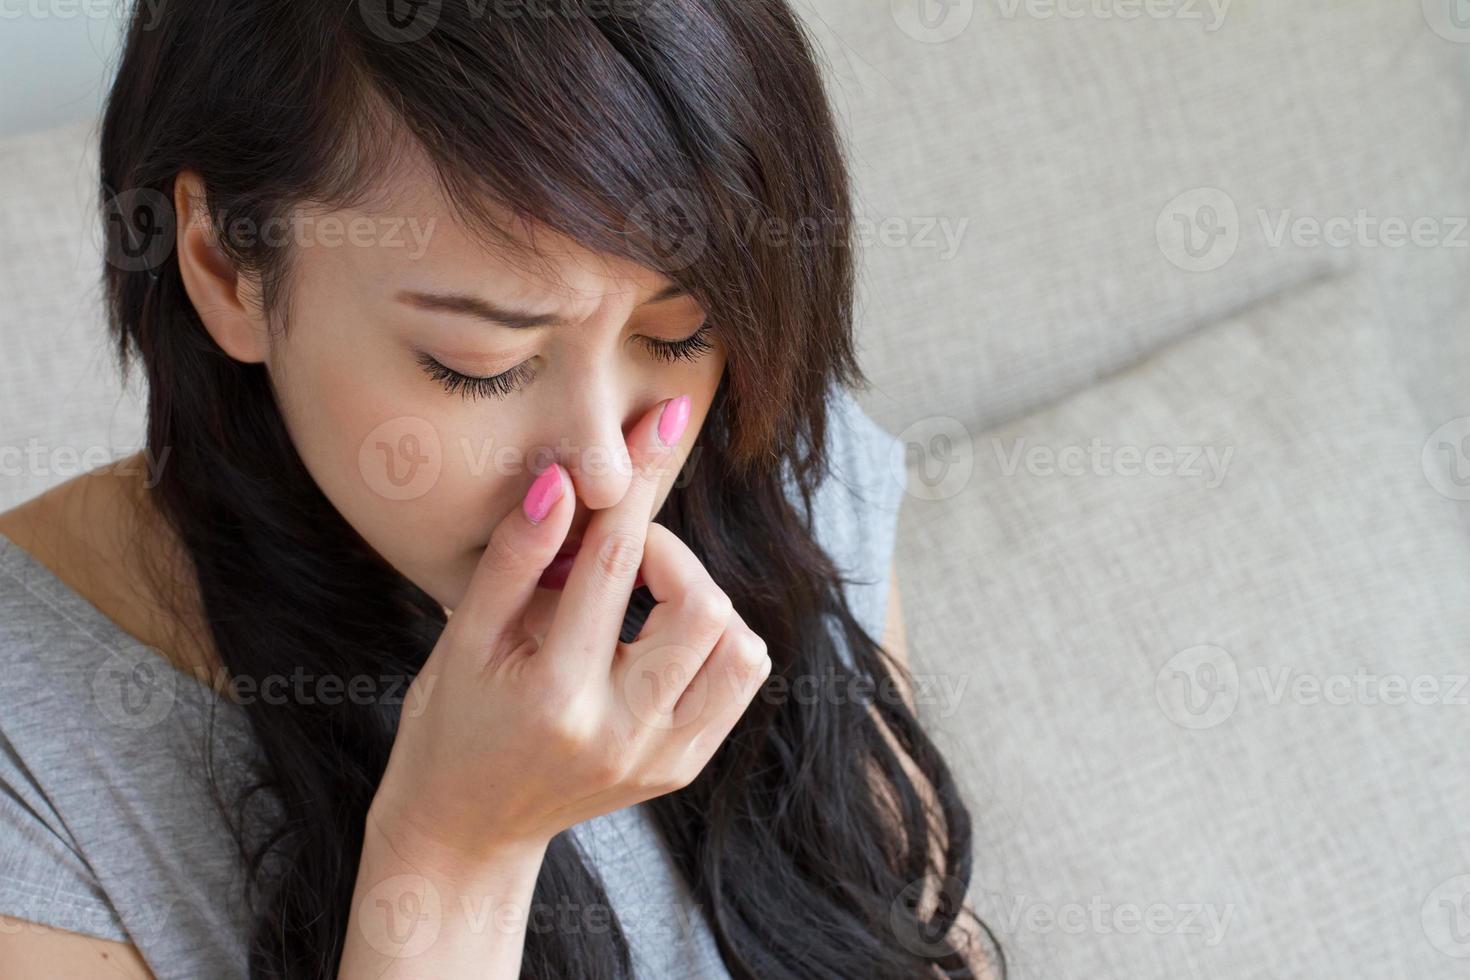 mulher doente sofre de gripe, resfriado, coriza, asiático caucasiano foto